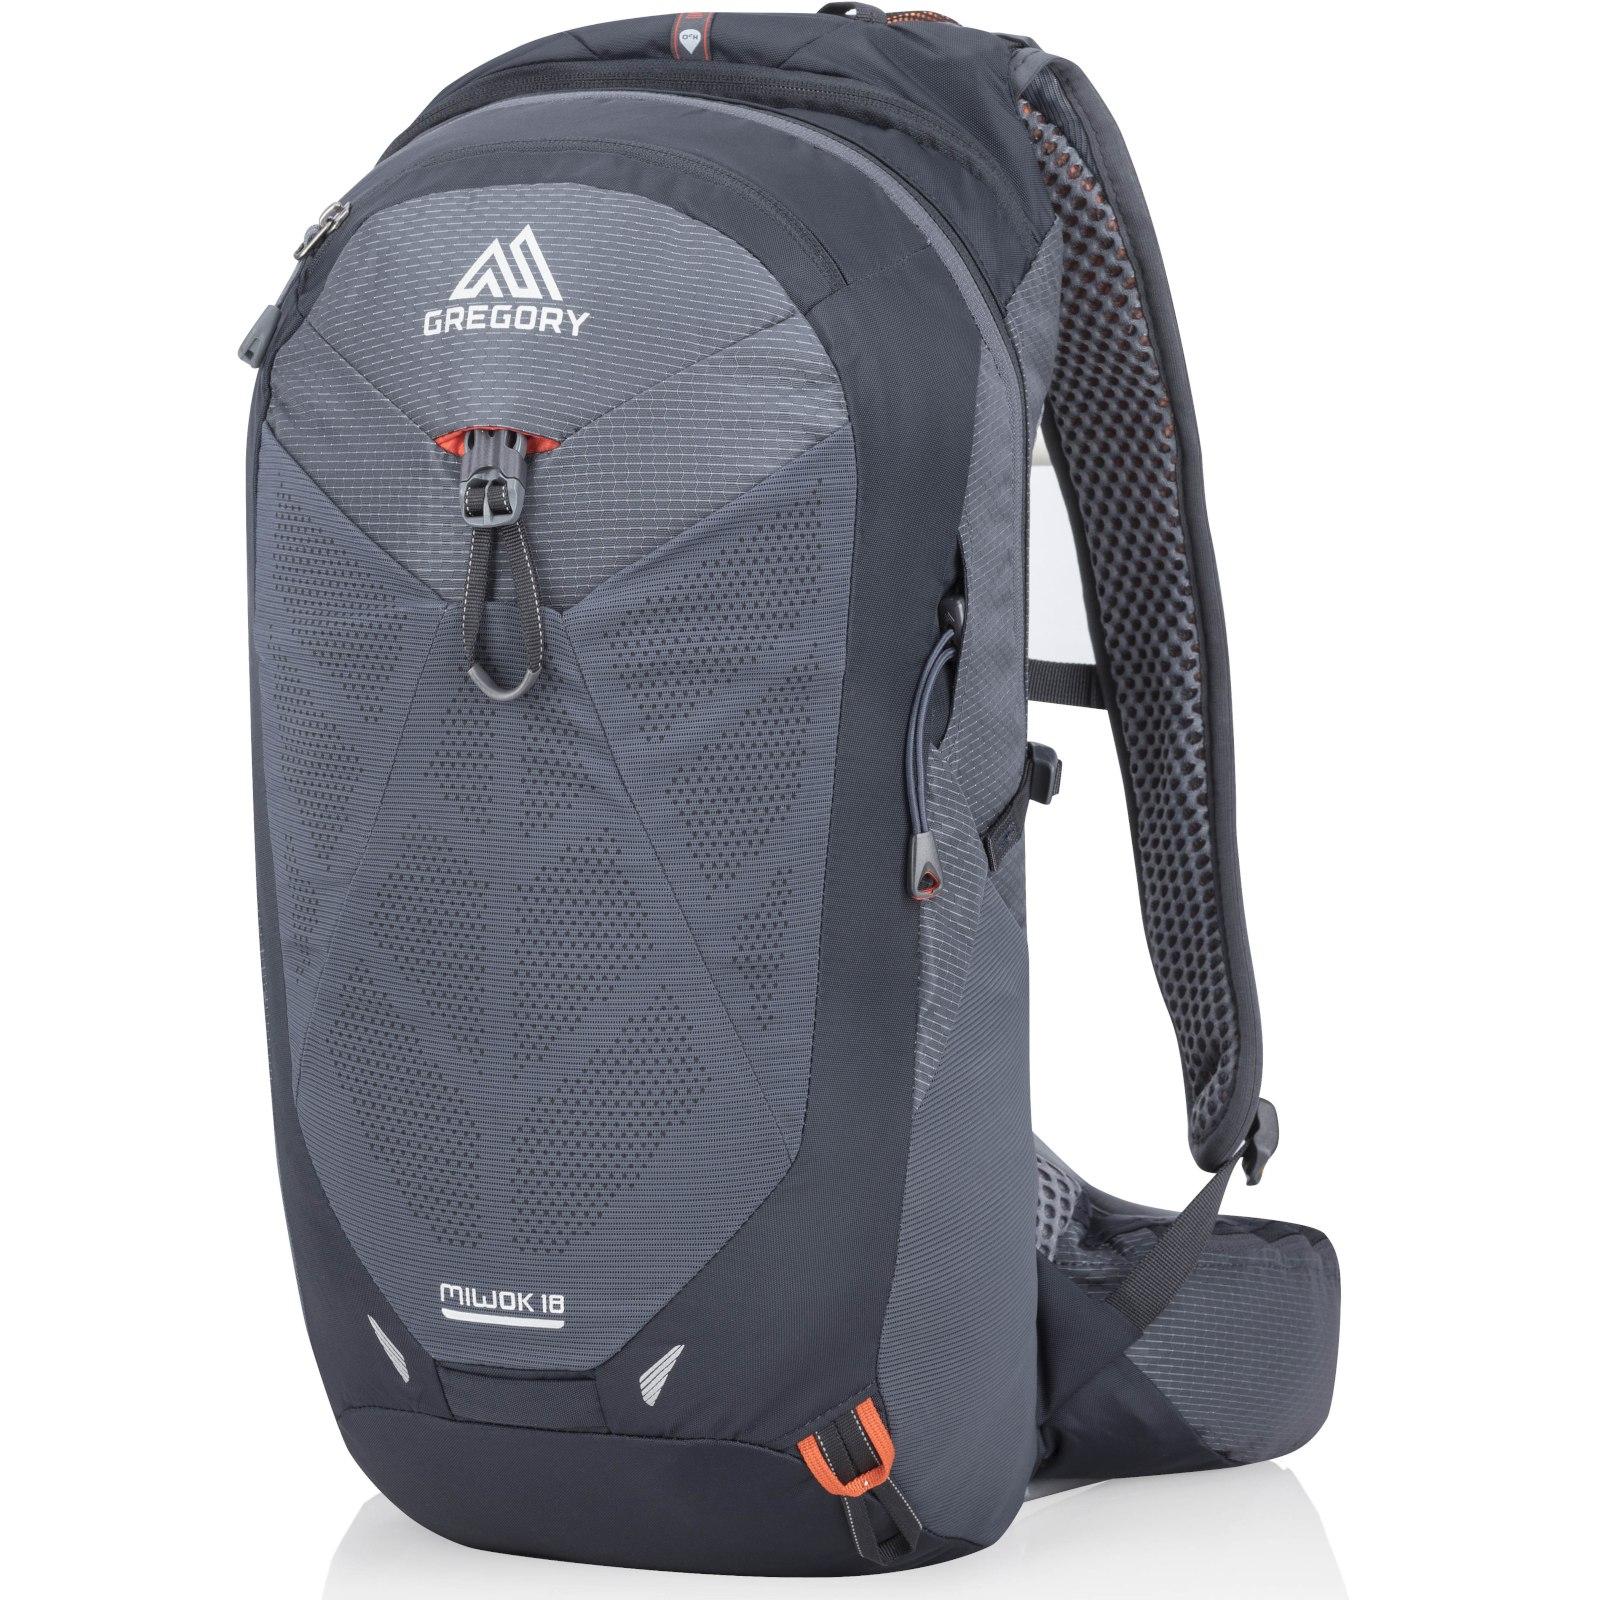 Gregory Miwok 18 Backpack - Flame Black